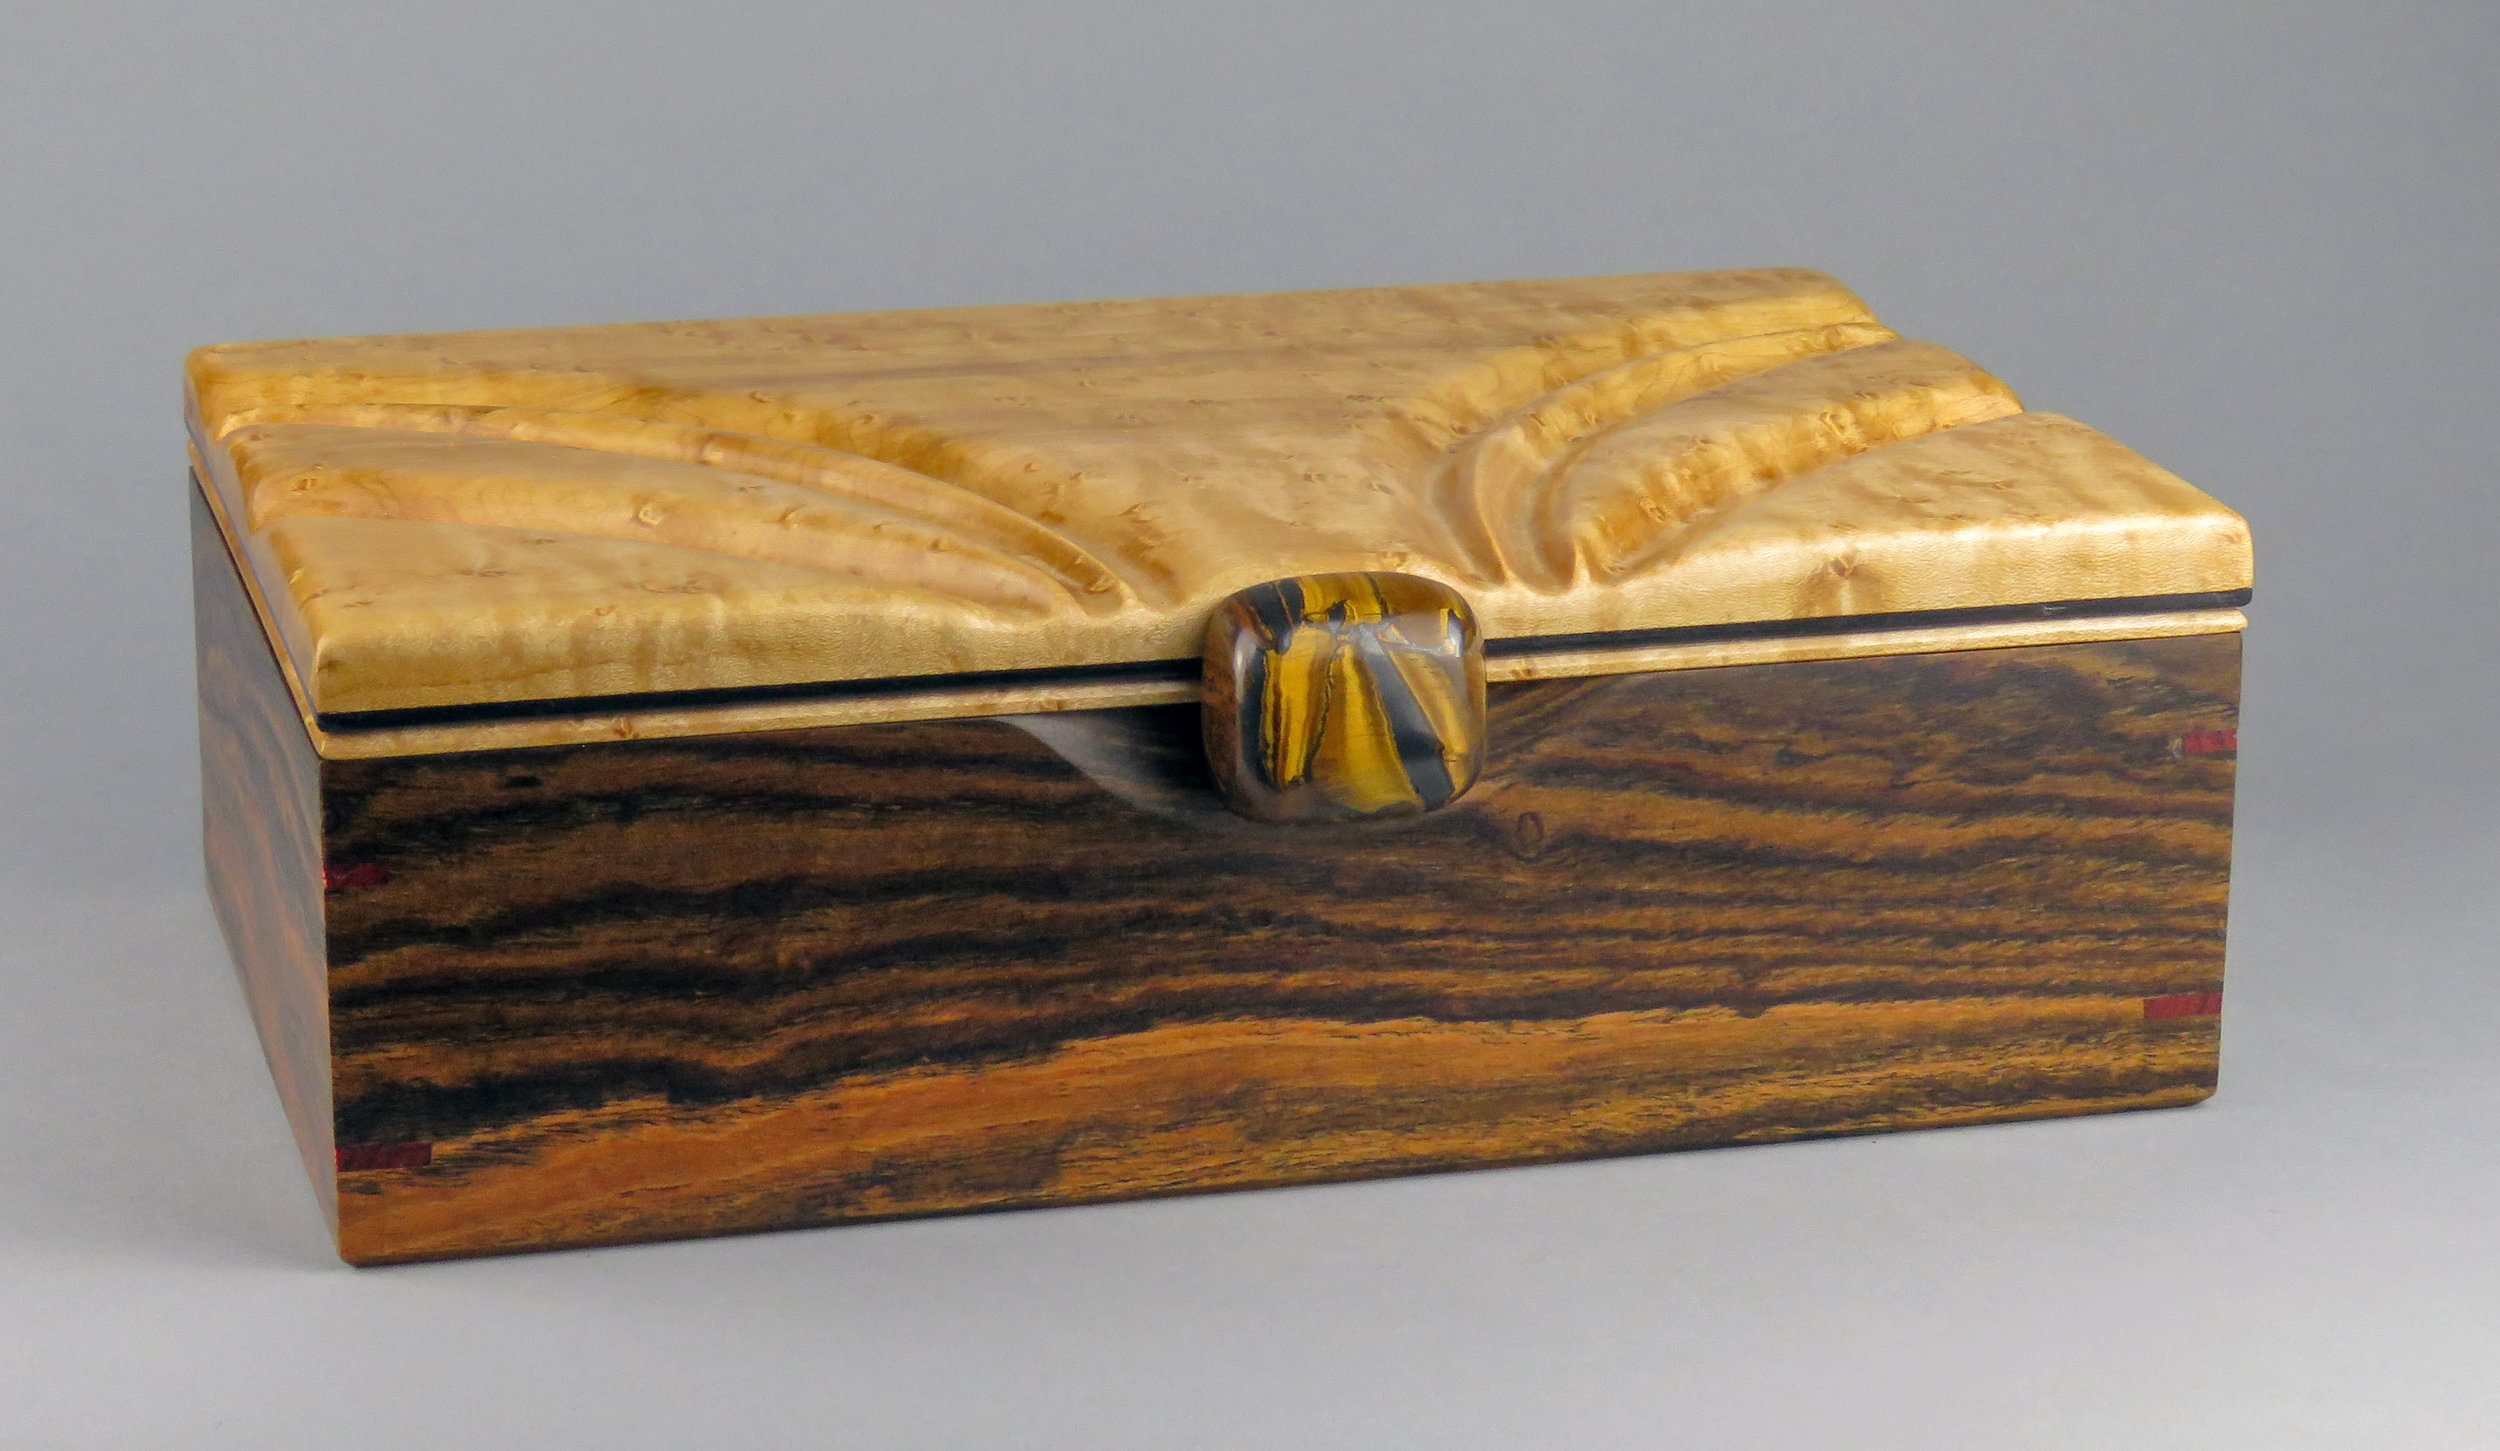 Tiger Eye Jewelry Box: $360 SOLD